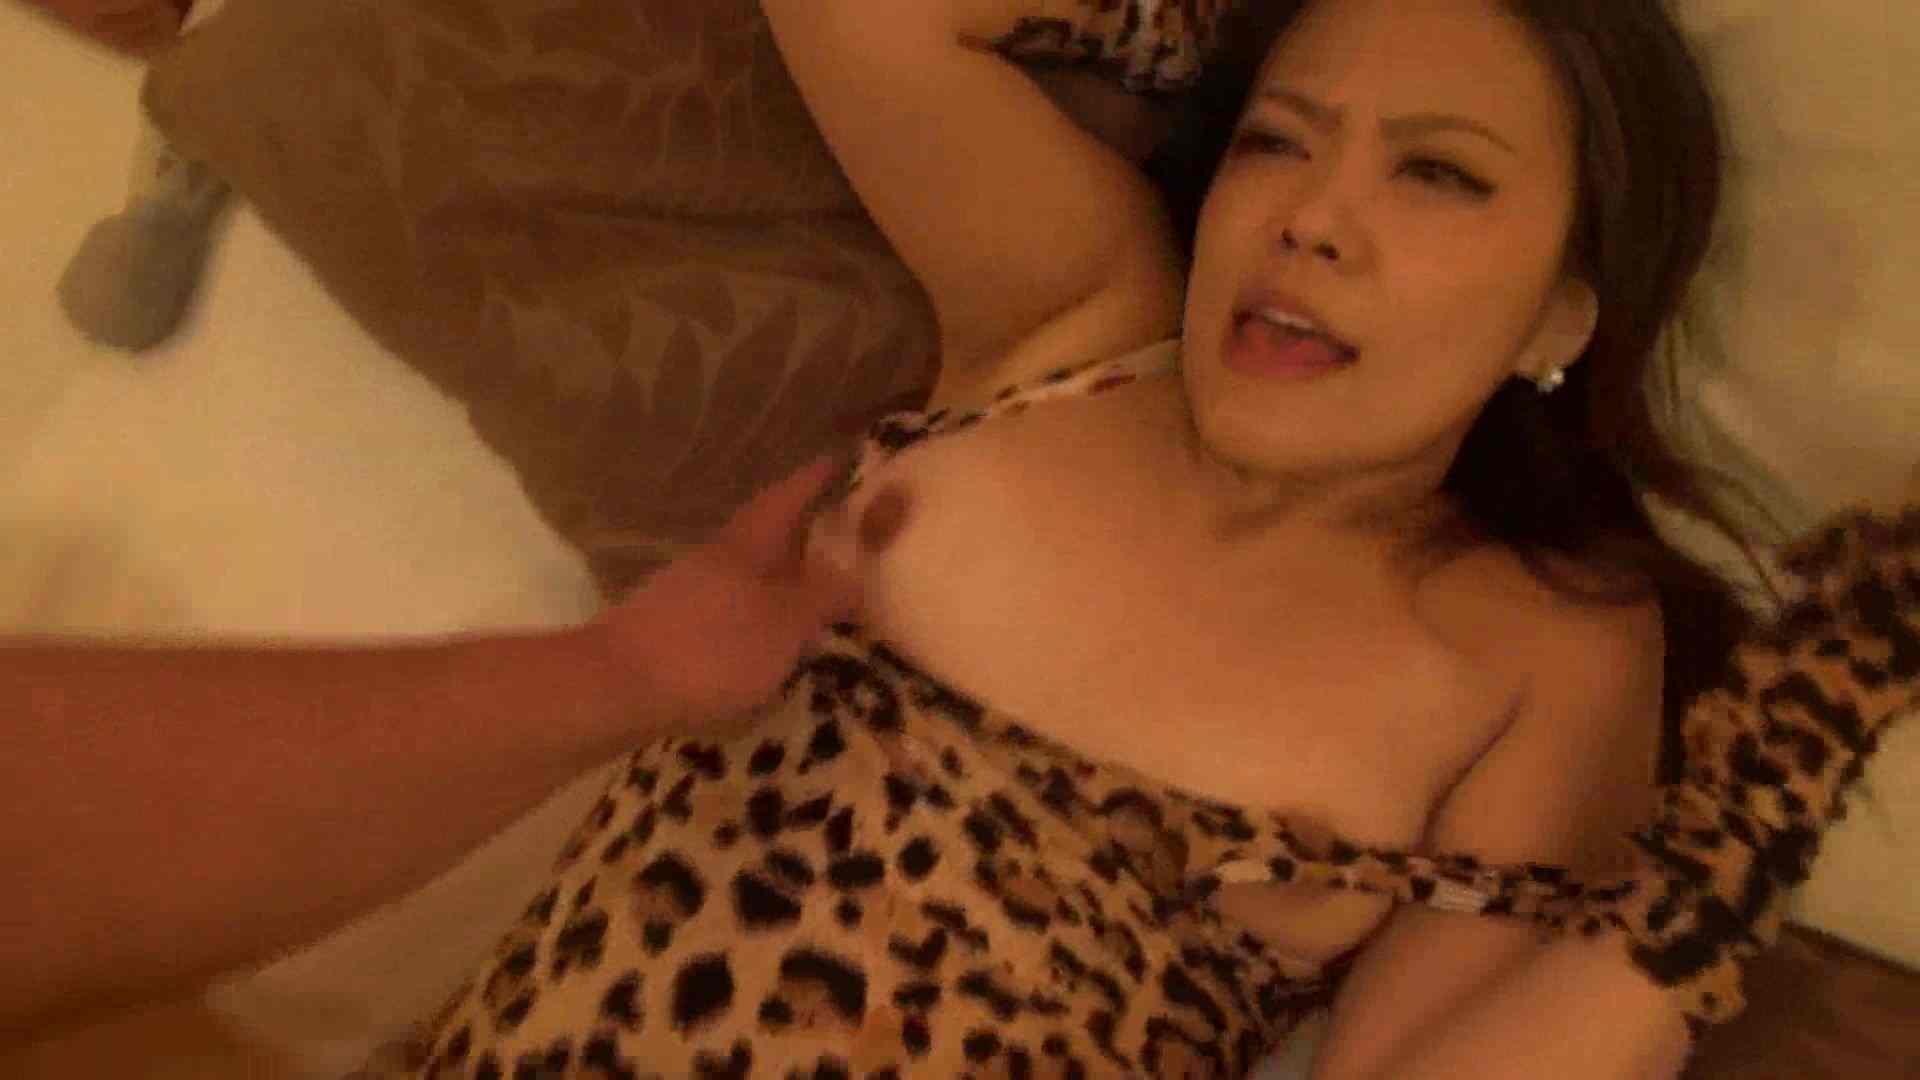 S級厳選美女ビッチガールVol.52 後編 モデルのエッチ | 美女ヌード天国  52PIX 31